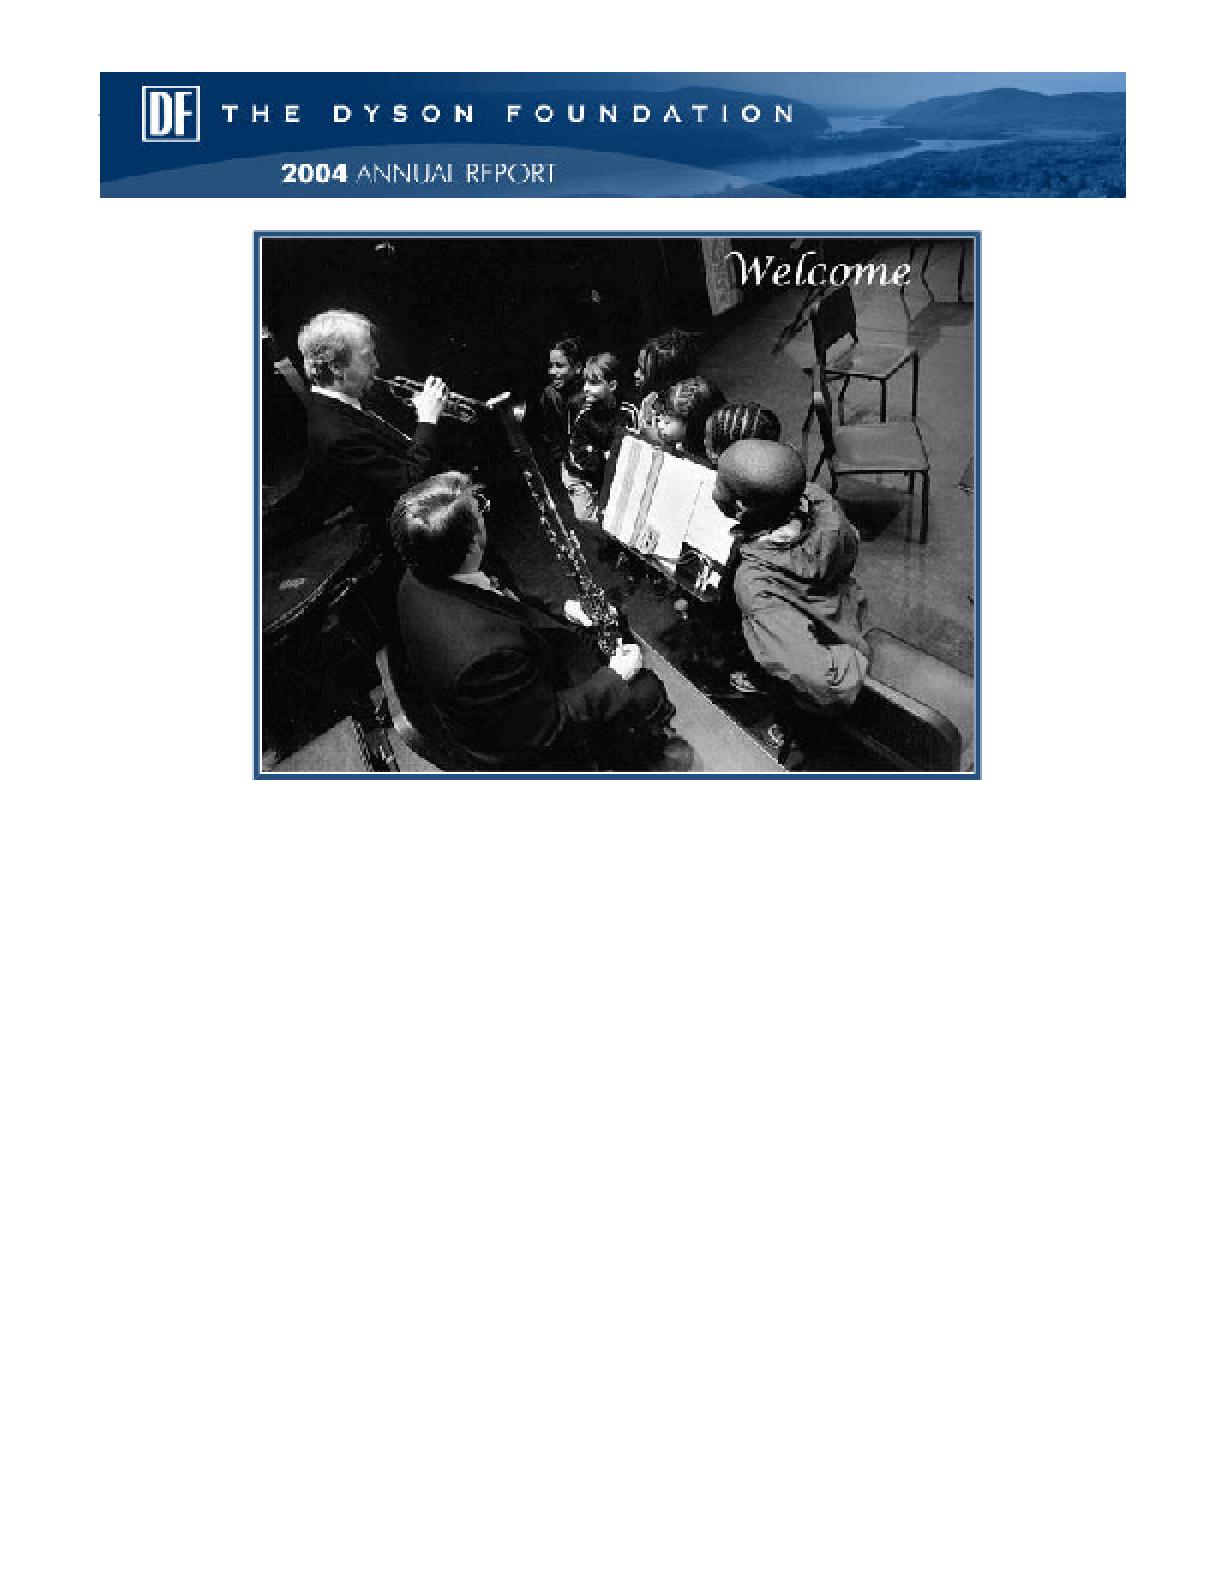 Dyson Foundation - 2004 Annual Report